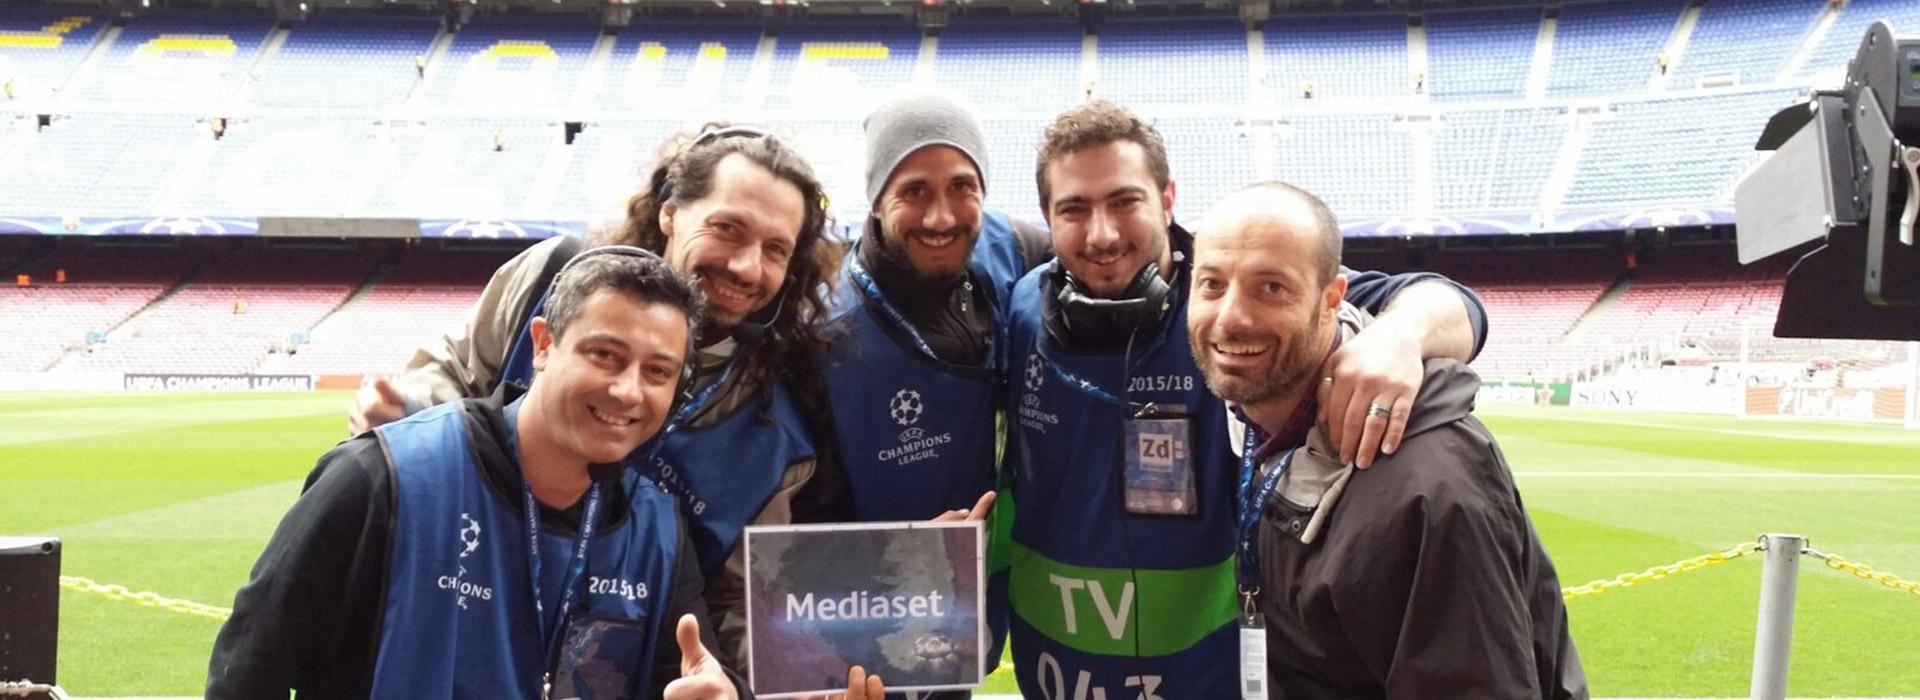 Il Team Videe alla Champions League per Mediaset